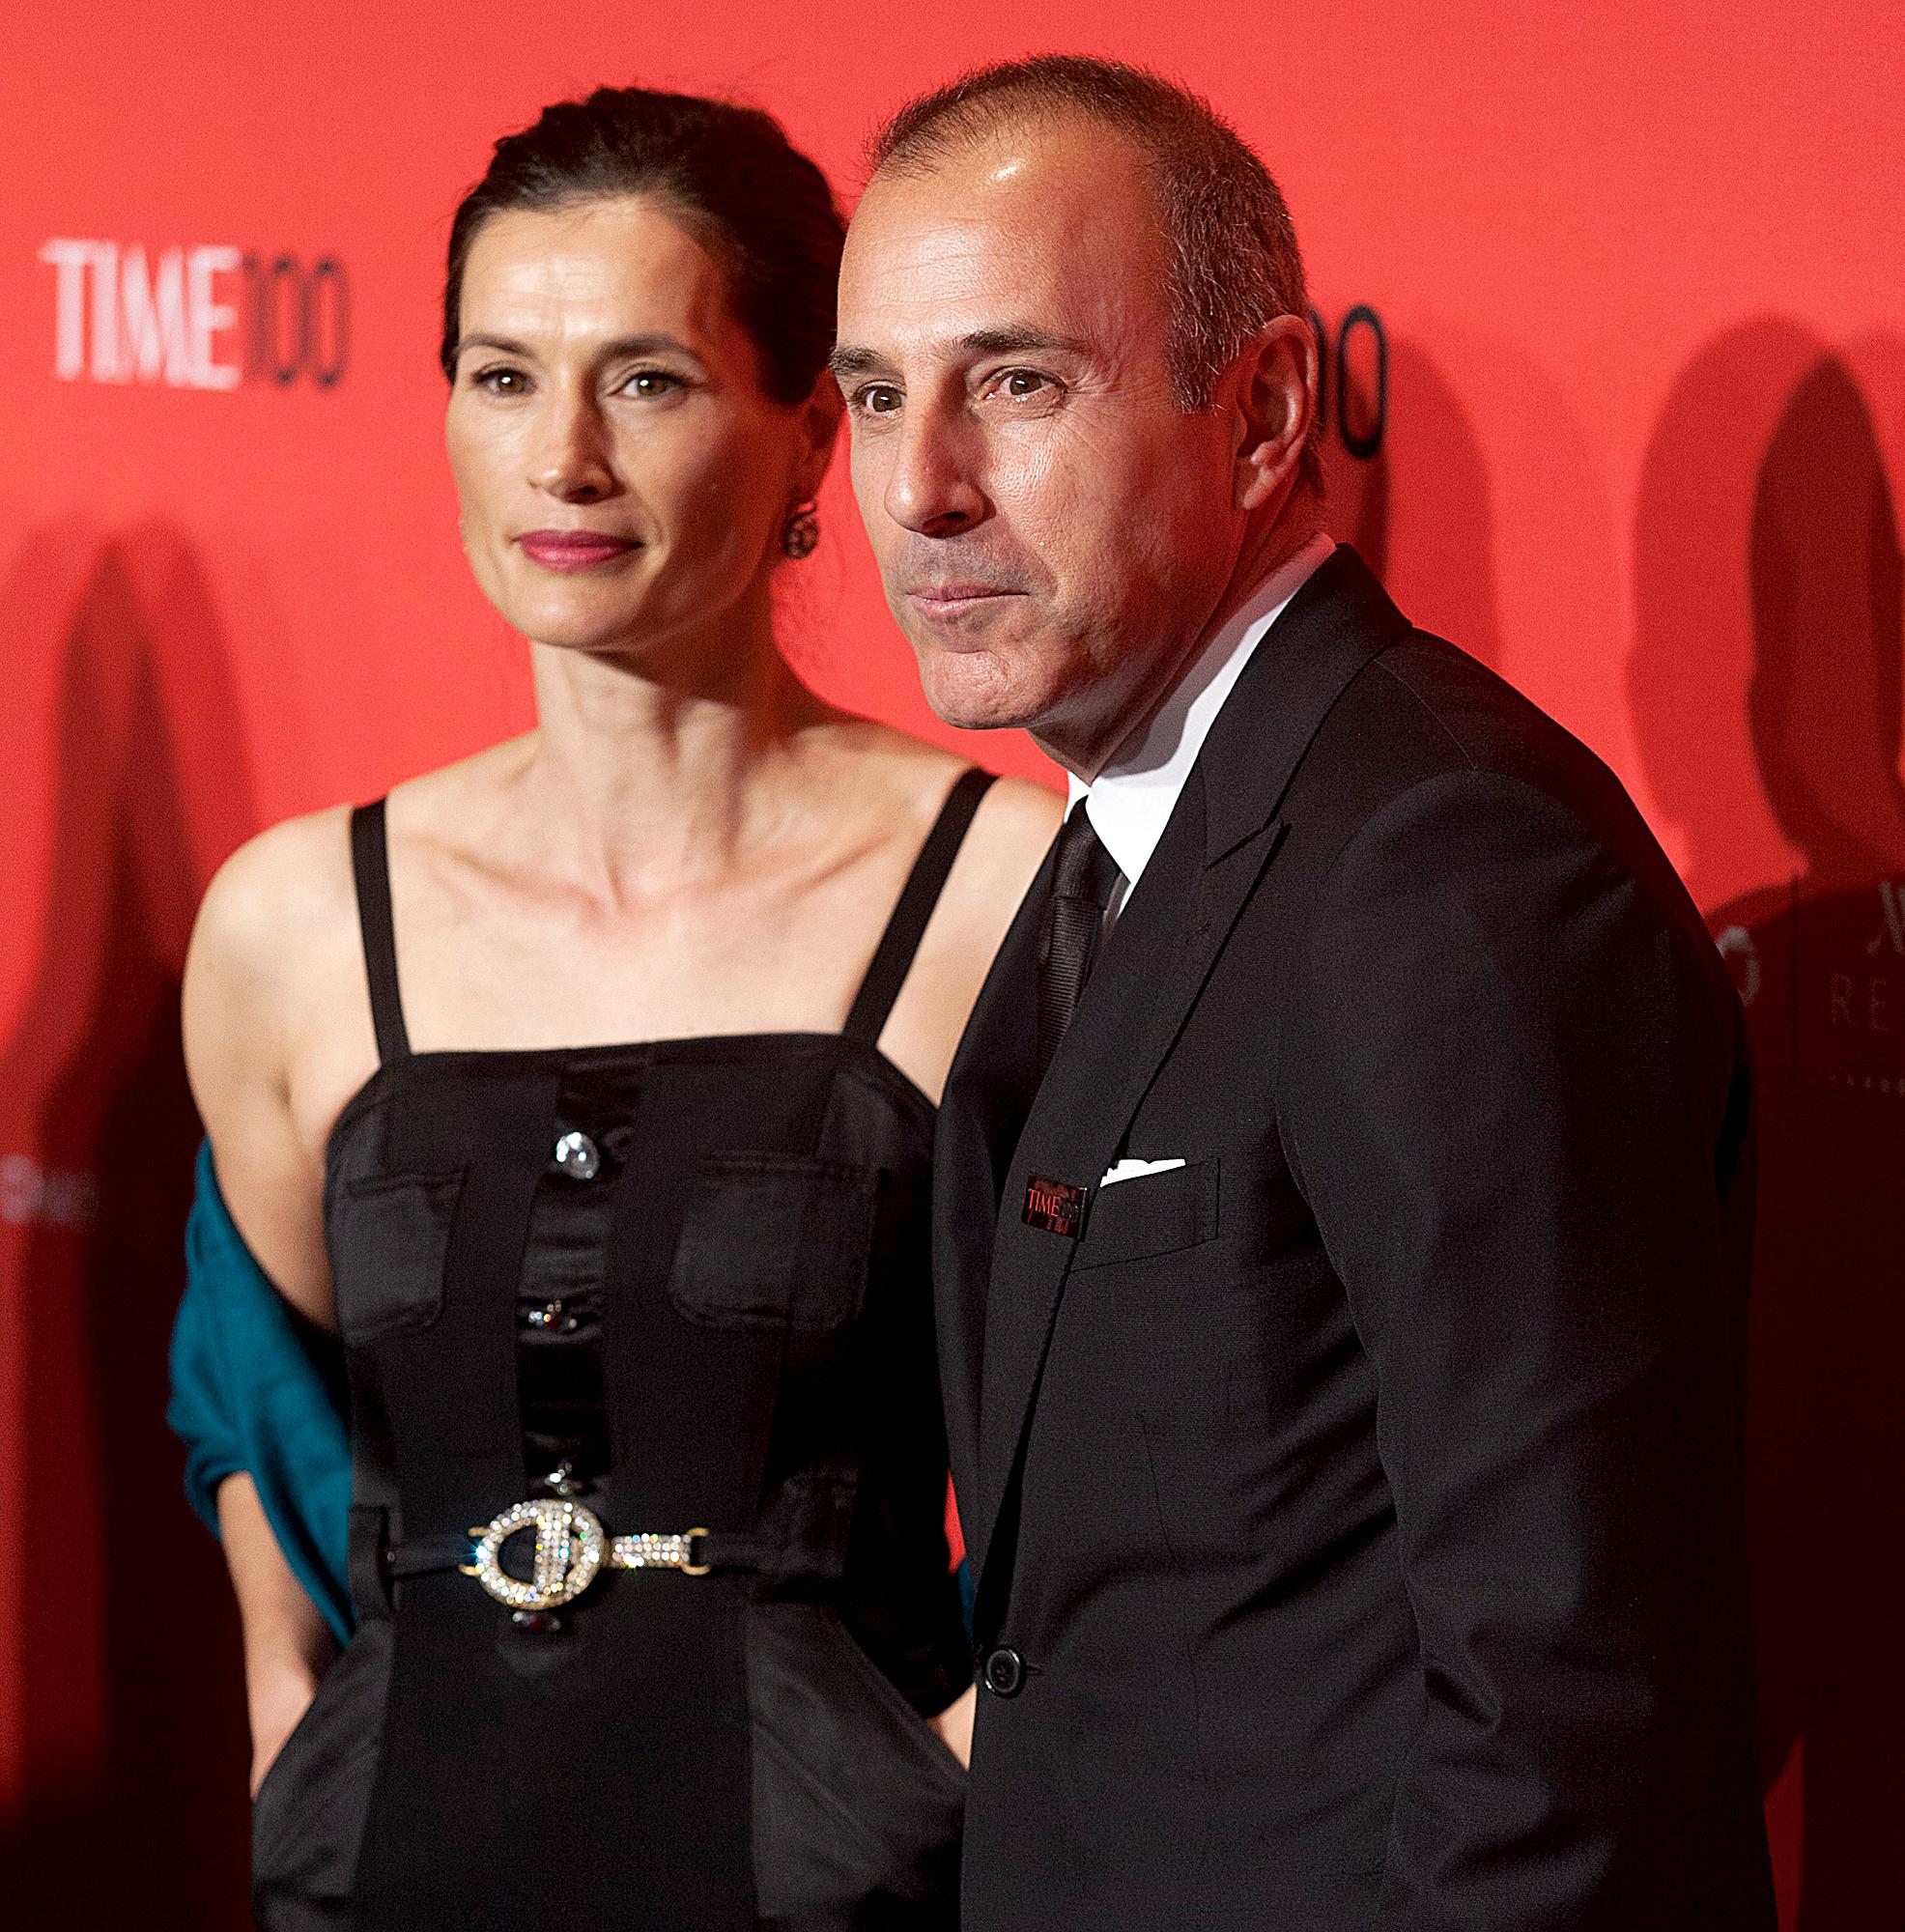 Matt-Lauer's-Estranged-Wife-Annette-Roque-hell-during-marriage